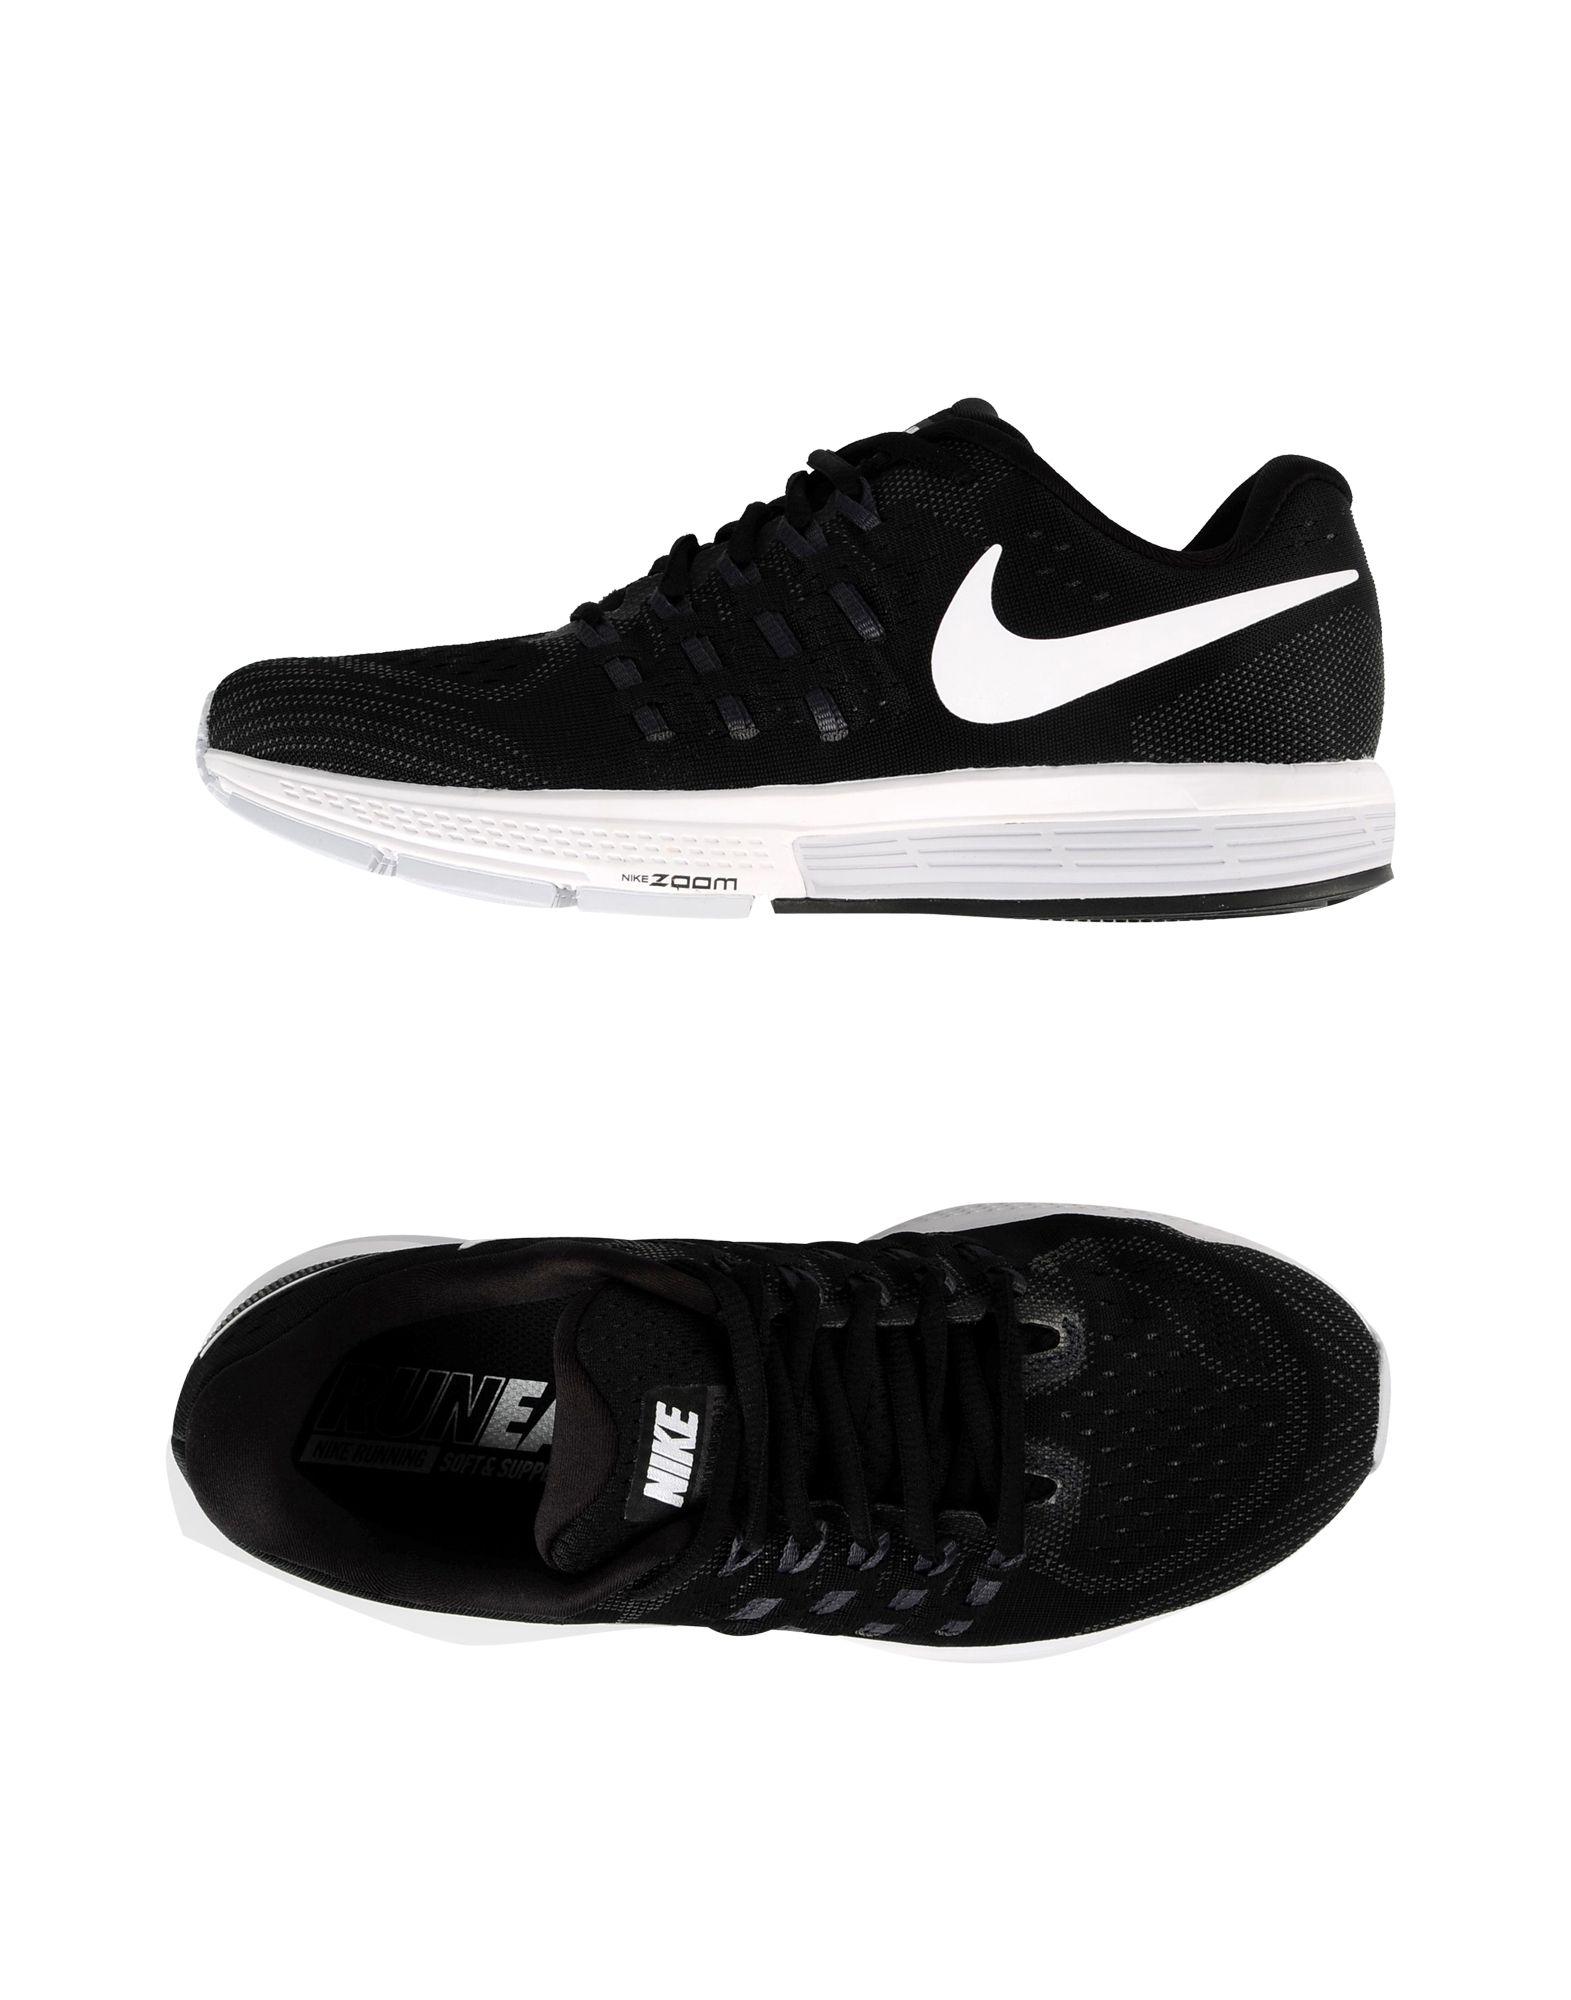 Scarpe 11 da Ginnastica Nike Air Zoom Vomero 11 Scarpe - Donna - 11100471MI d3451b